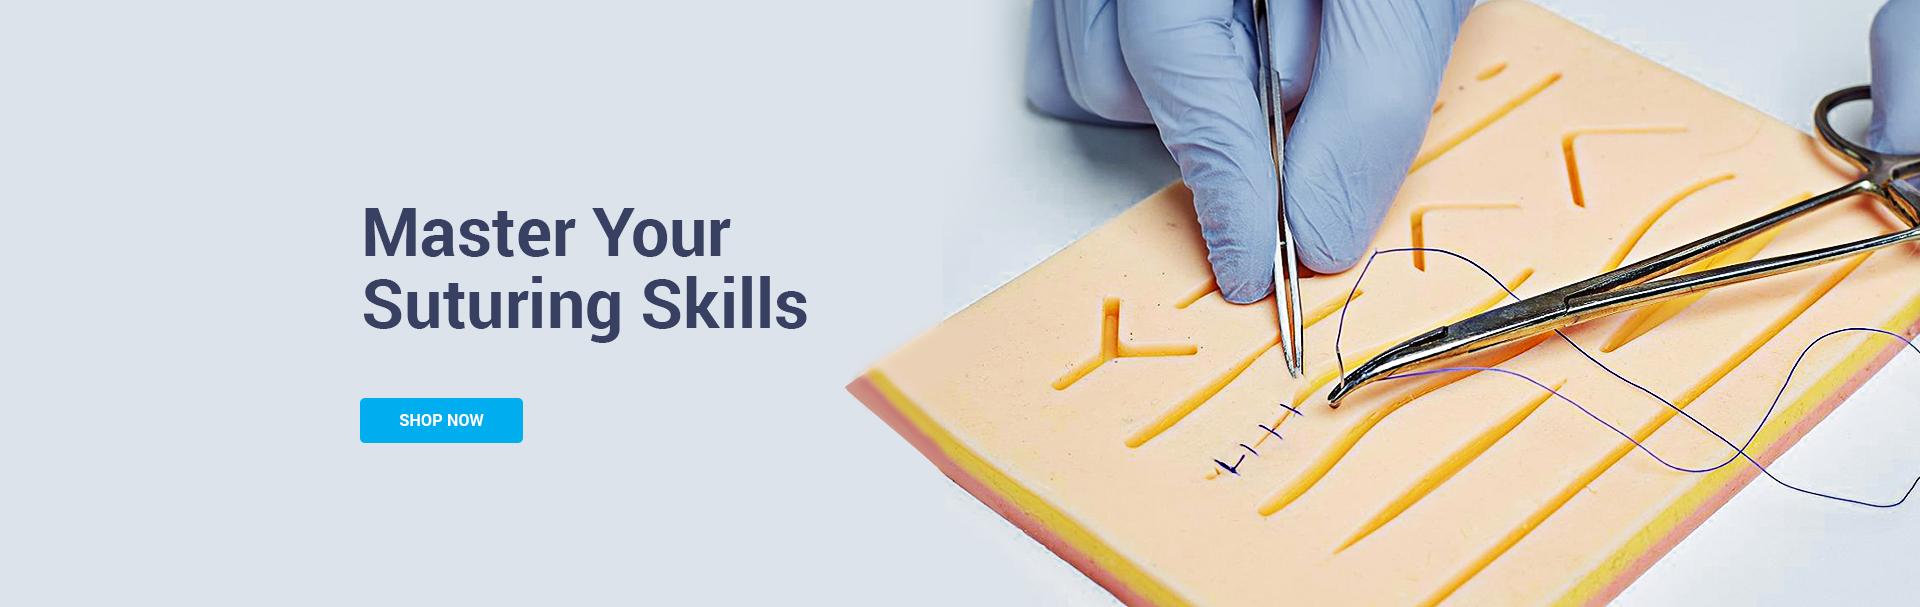 suturing-skills